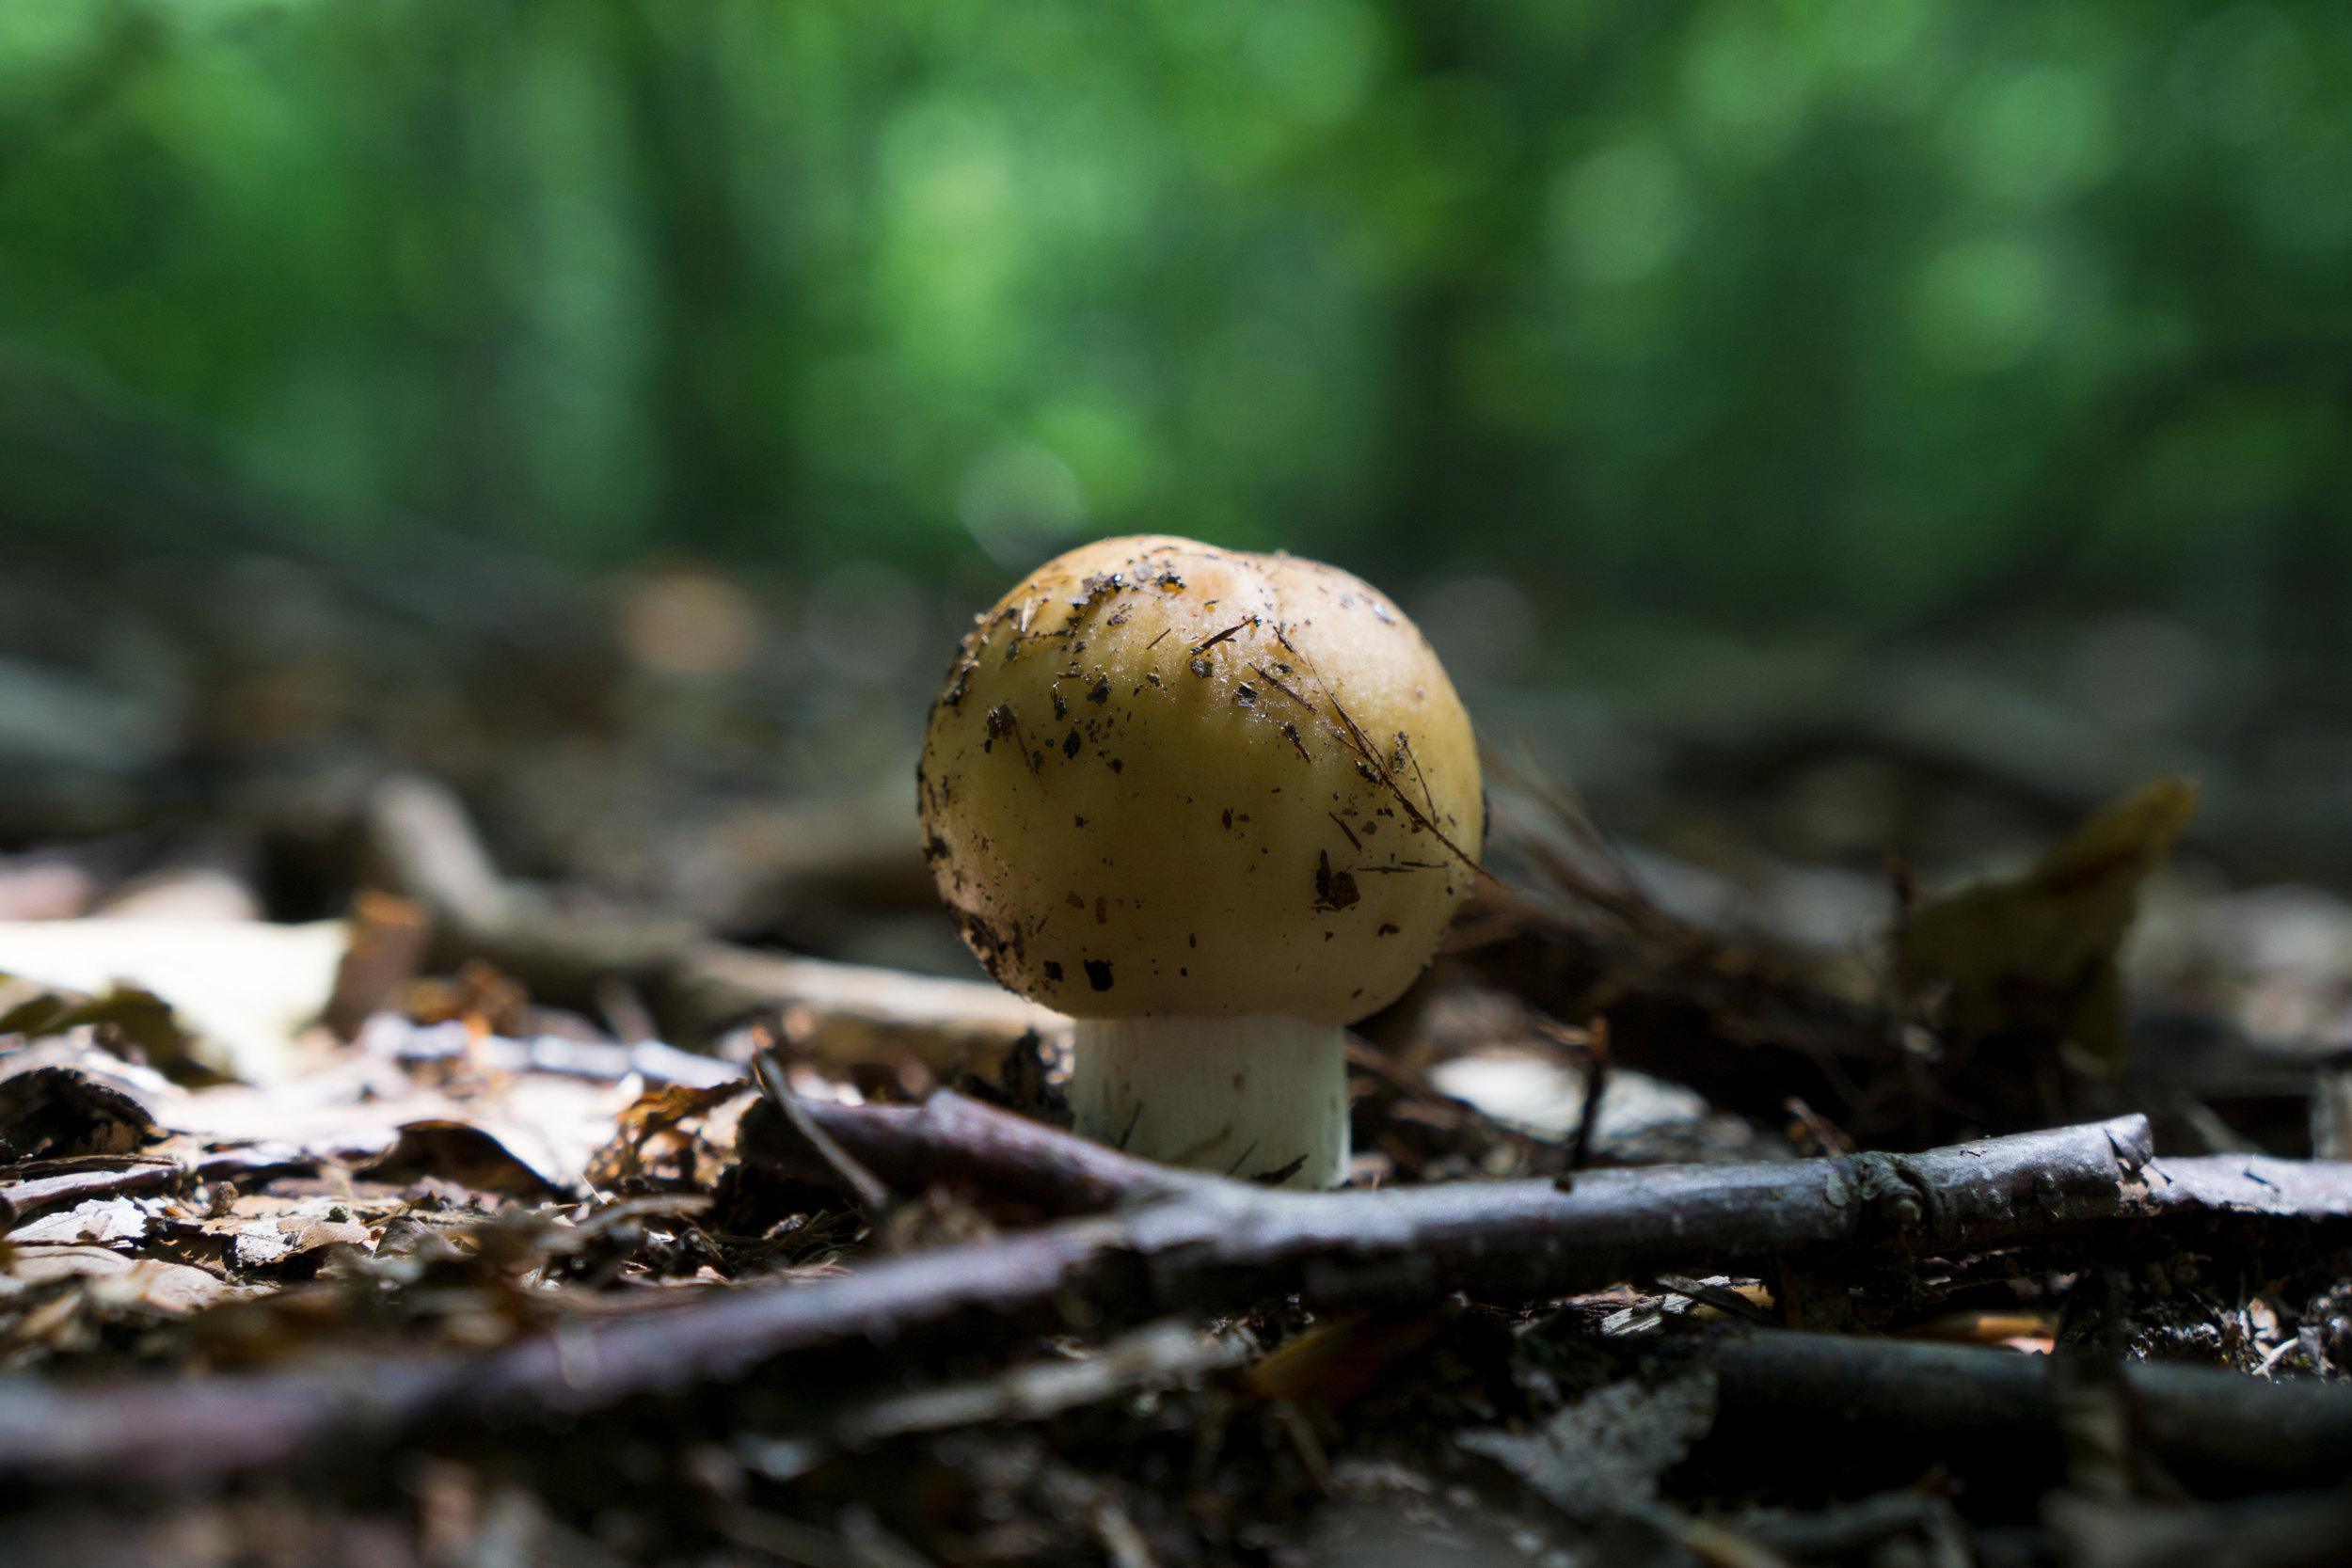 vickygood_photography_nature_mushroom4.jpg